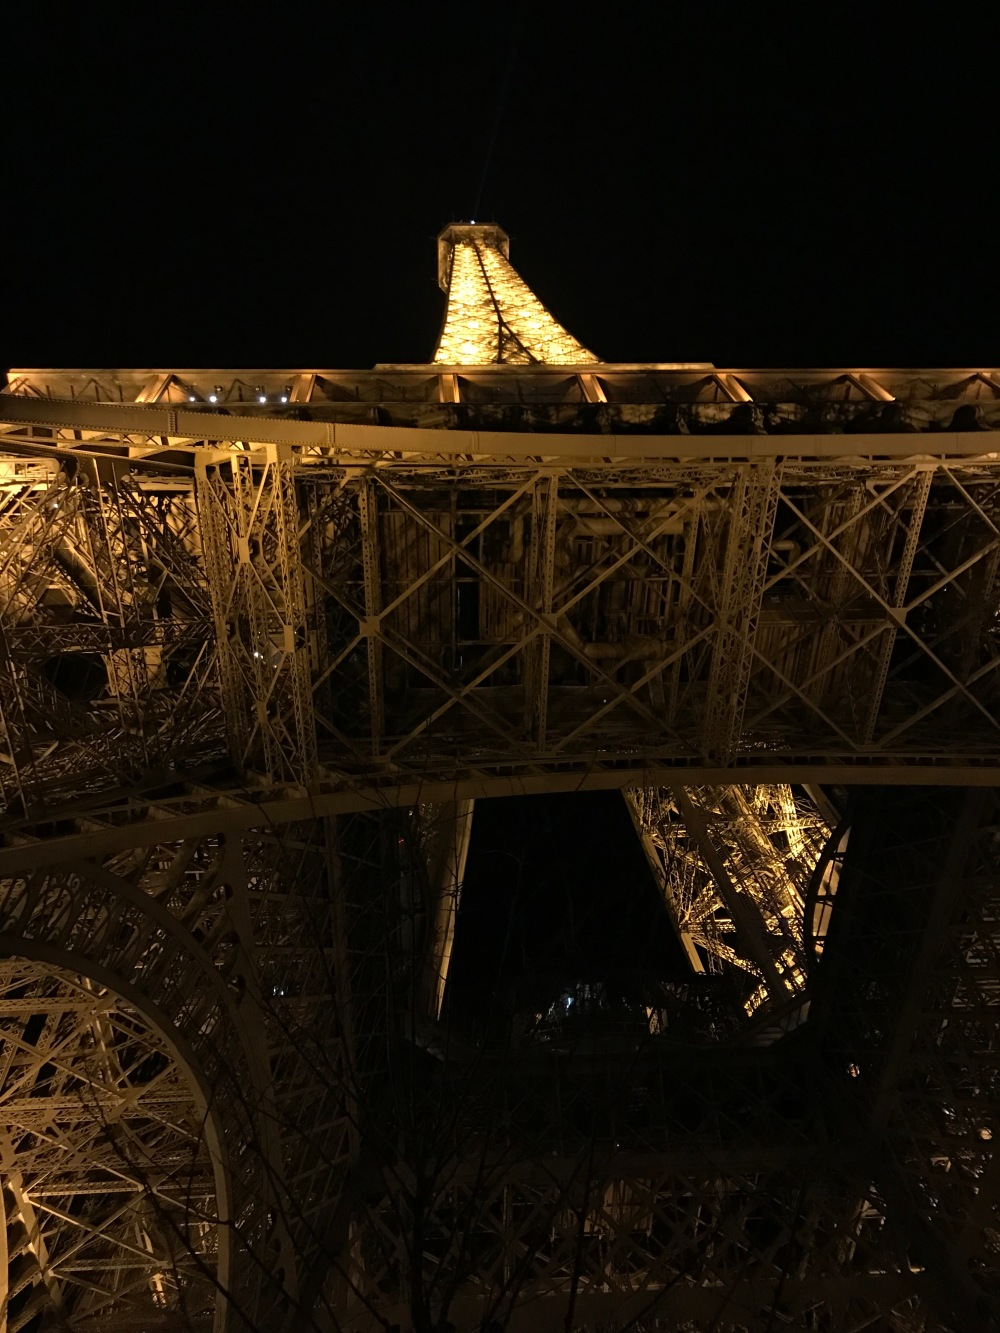 Torre Eiffel vista noturna com luzes